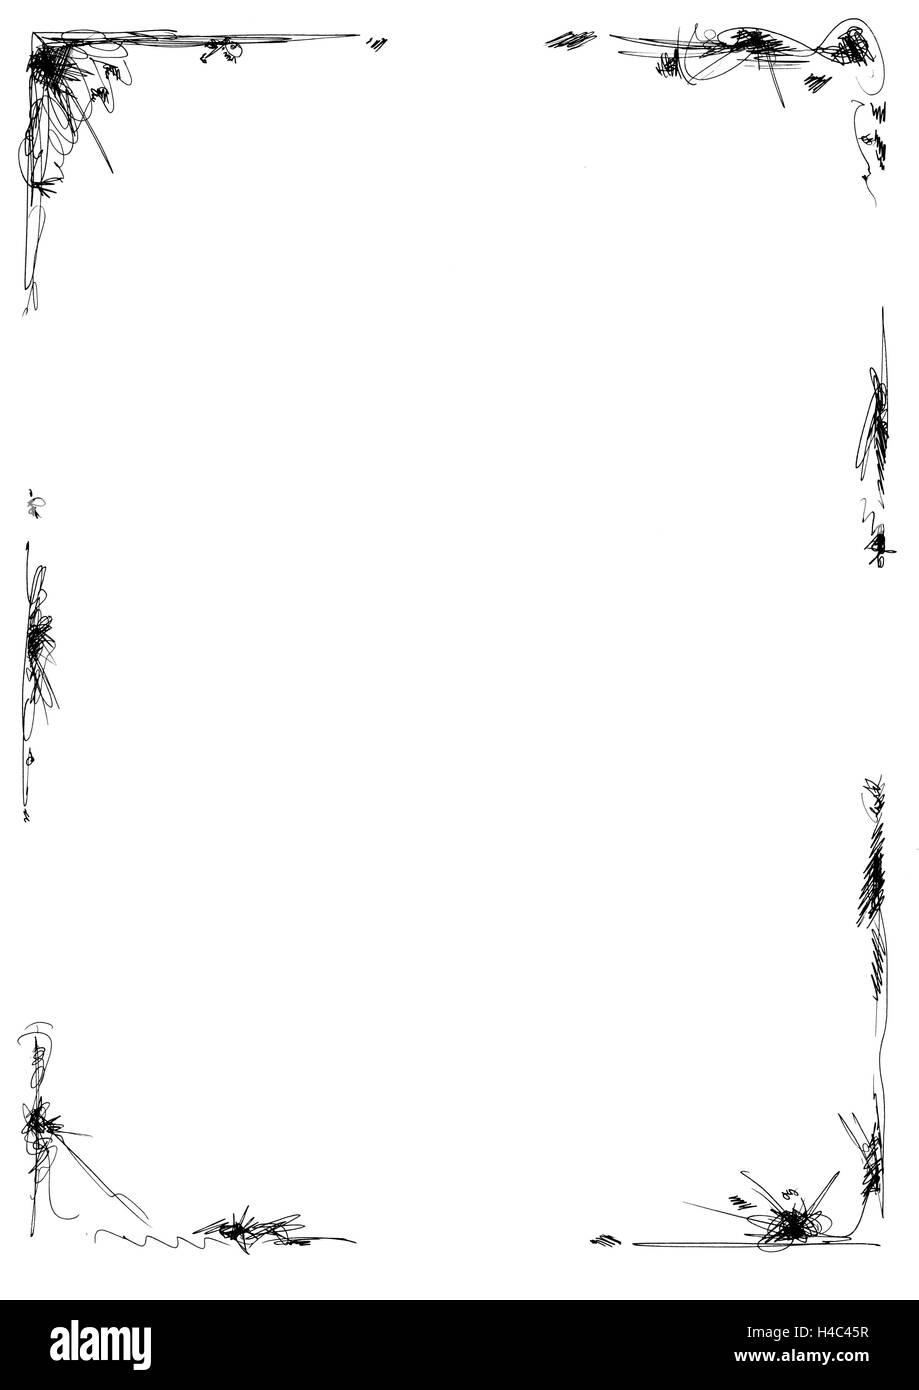 Menu card with a simple frame Stock Photo: 123197923 - Alamy